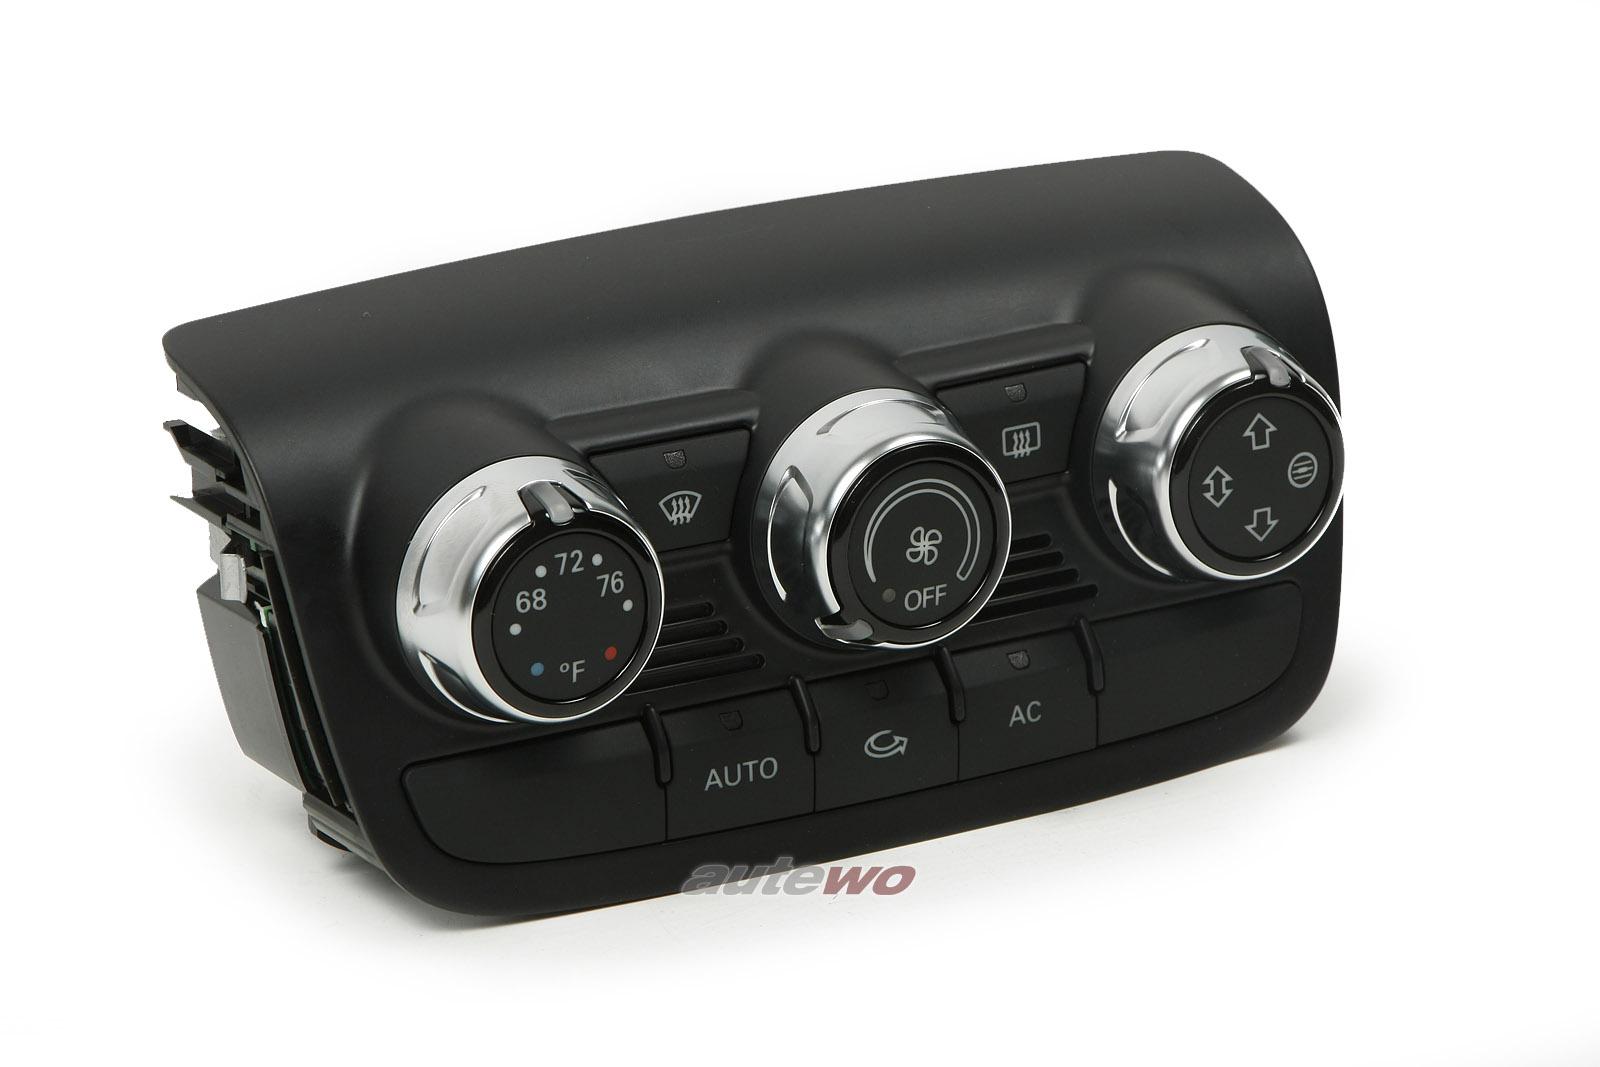 8J0820043AR/AH/T NEU Audi TT/TTS 8J Klimatronic-Bedienteil US-Ausführung